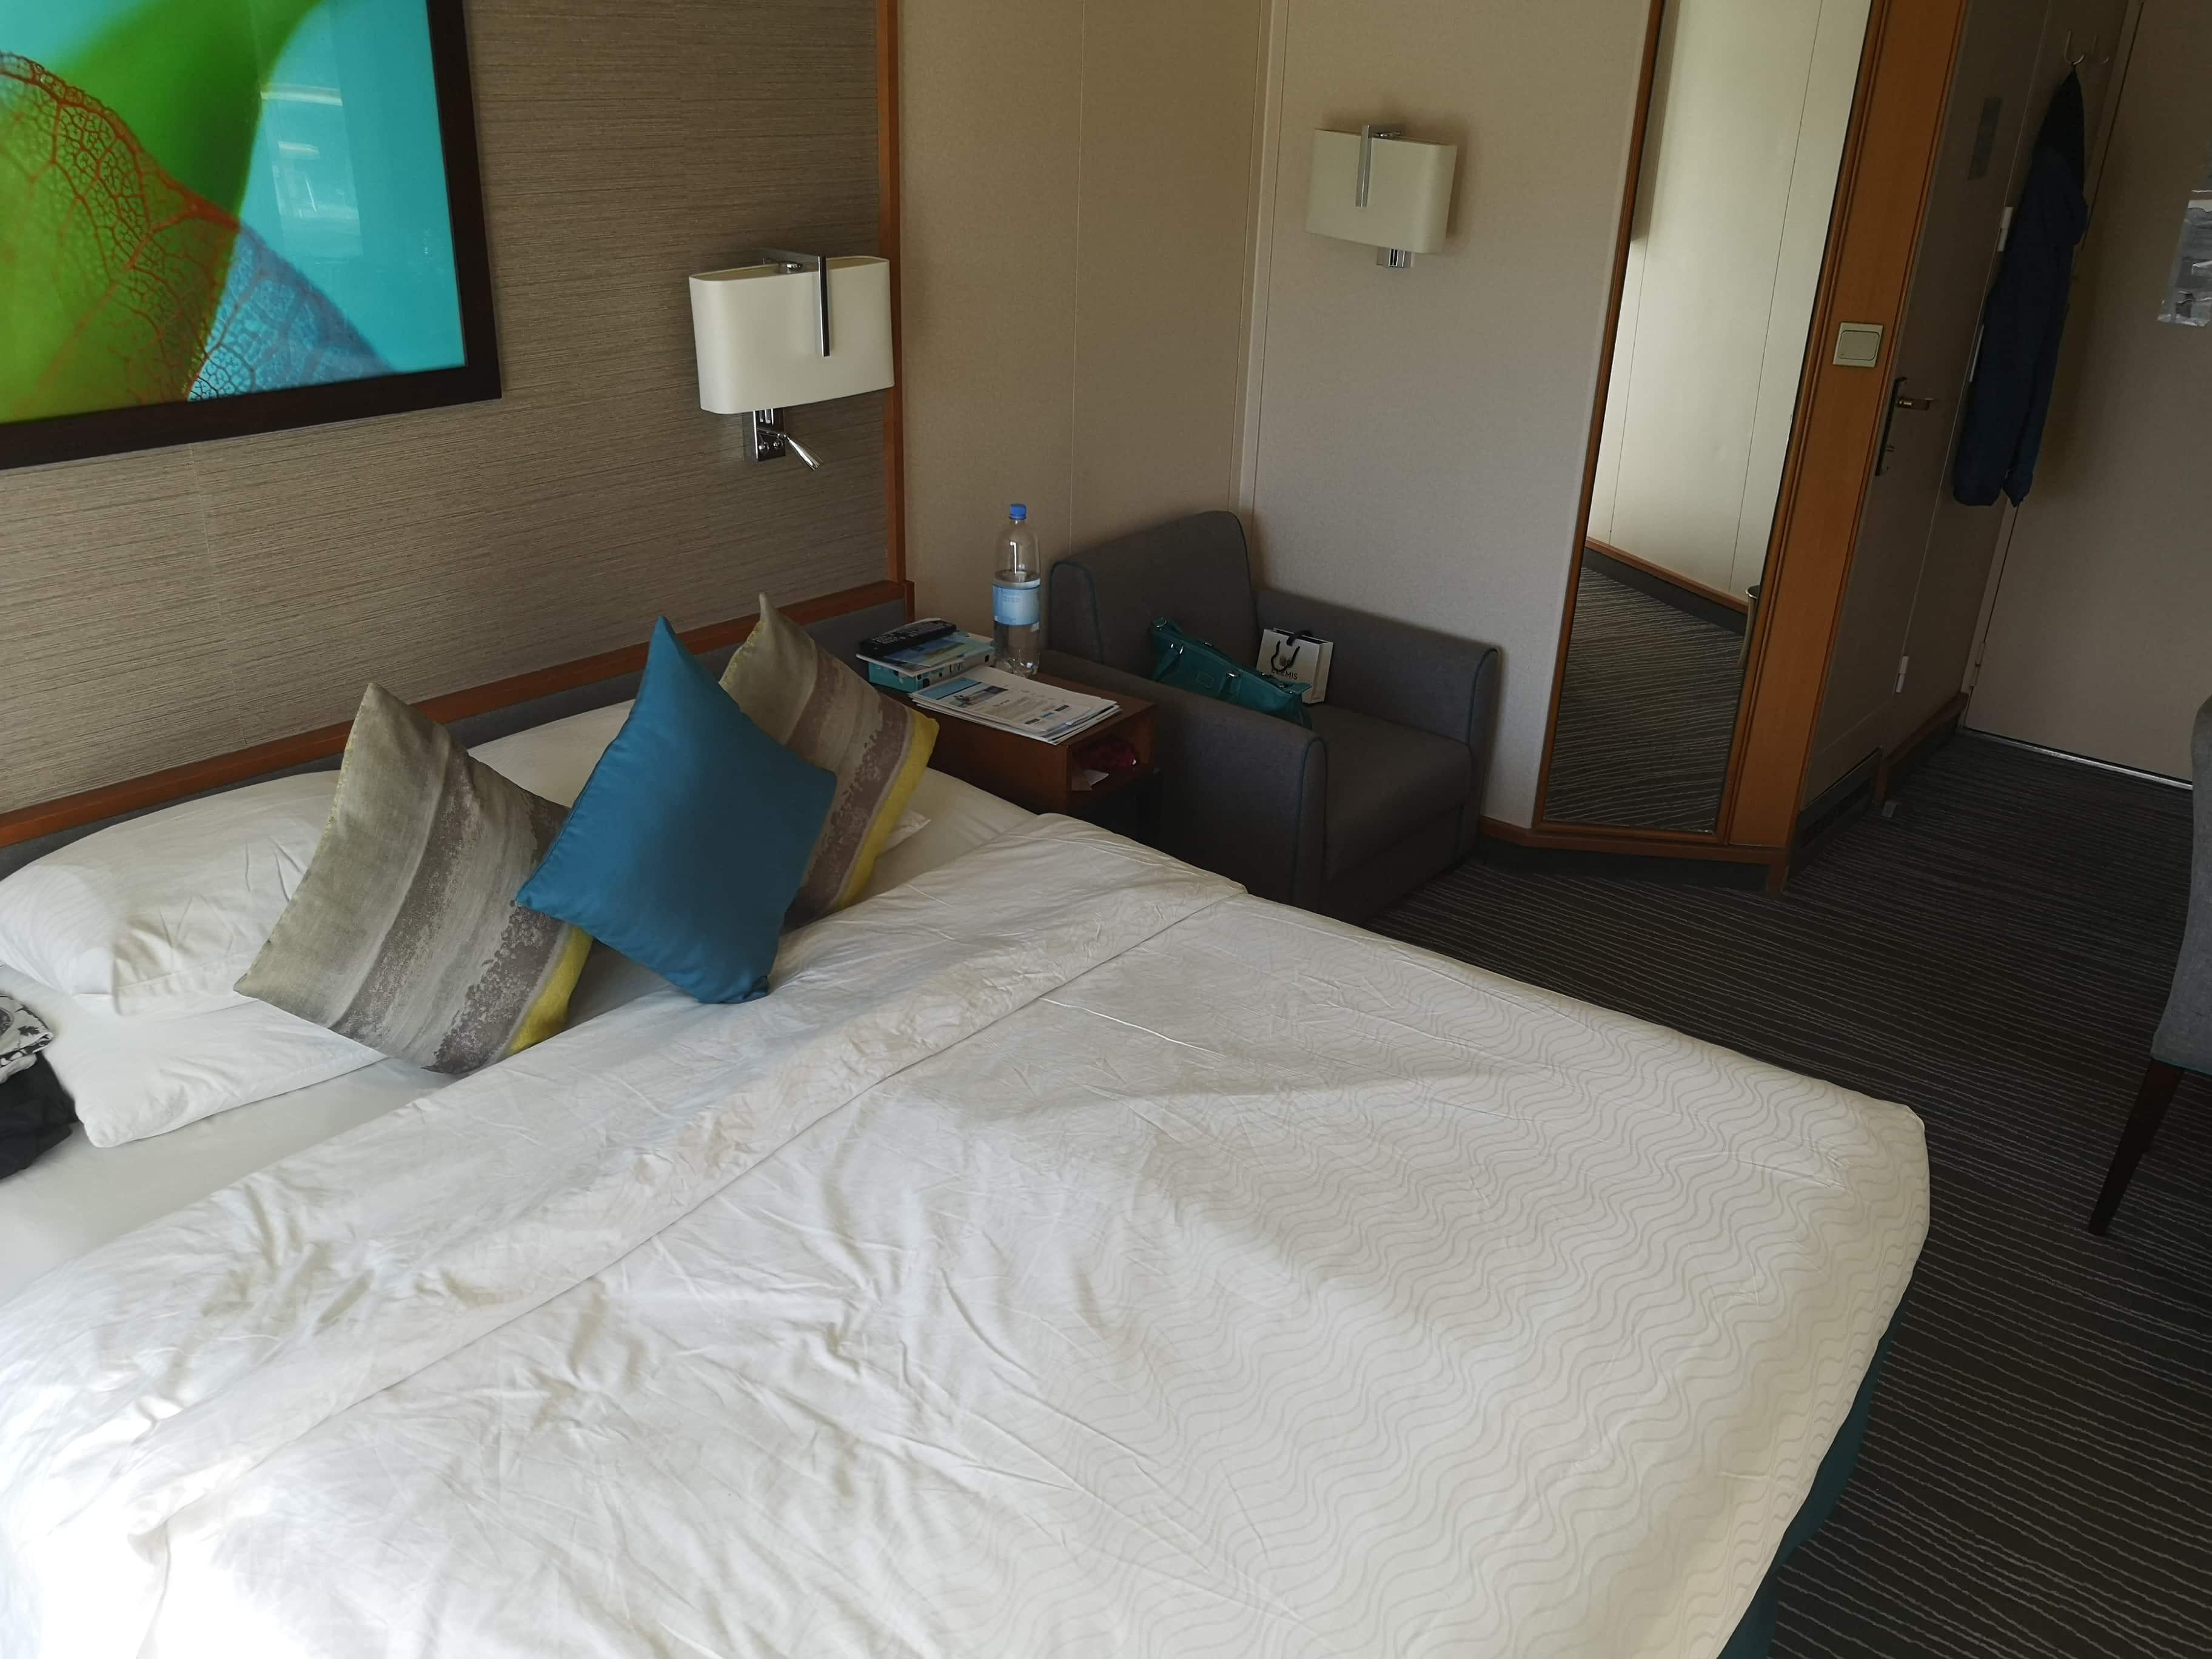 Marella Discovery Balcony Cabin  Bed Chair Bathroom Desk